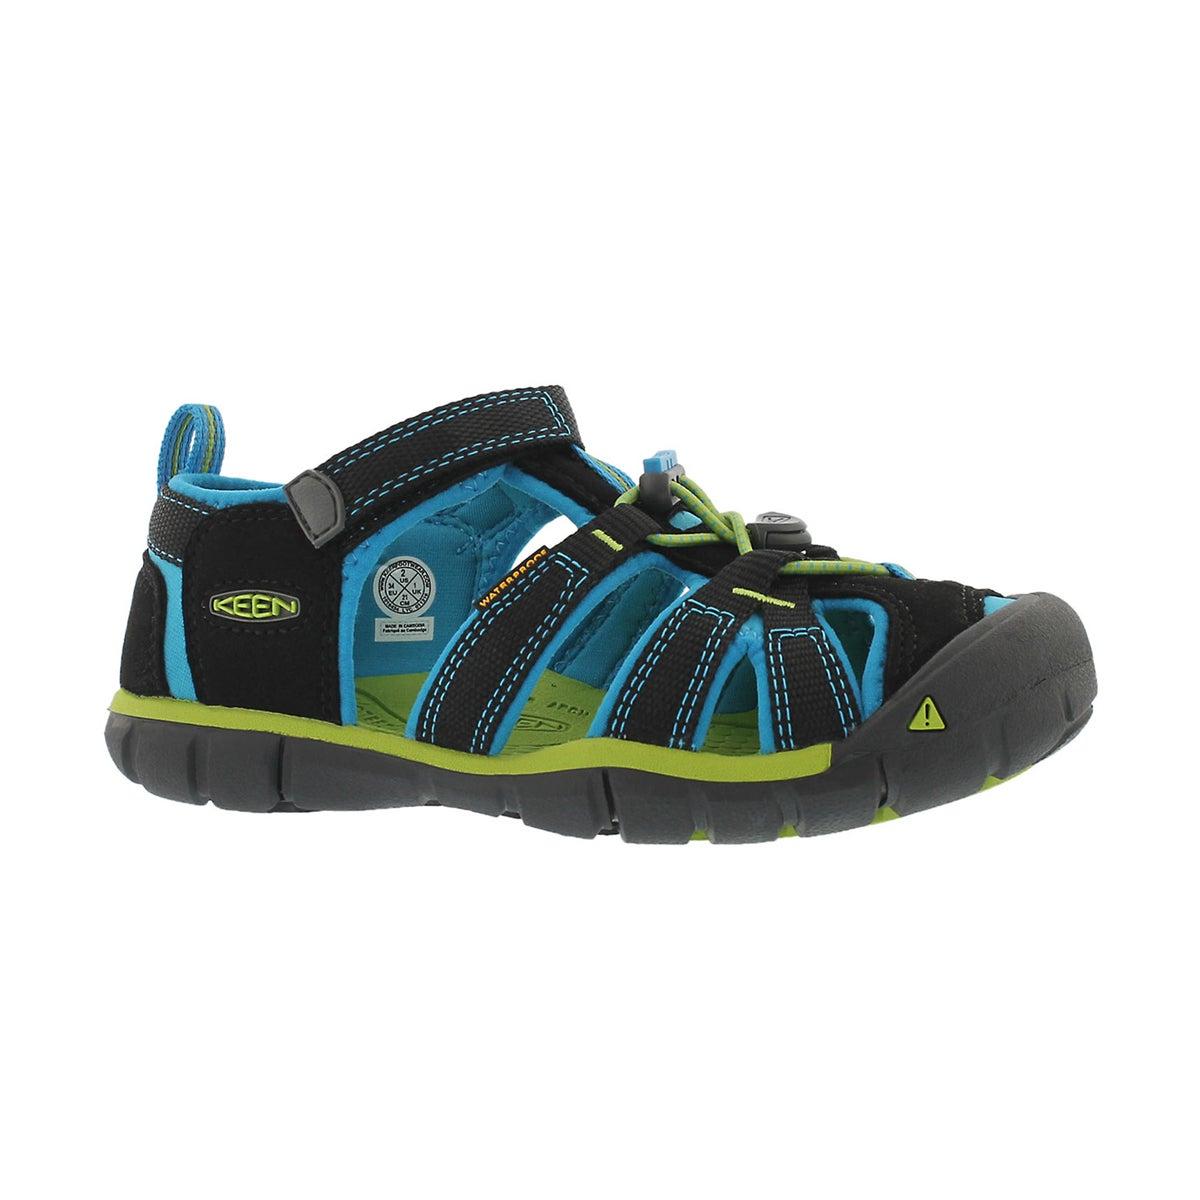 Boys' SEACAMP II black/blue sport sandals